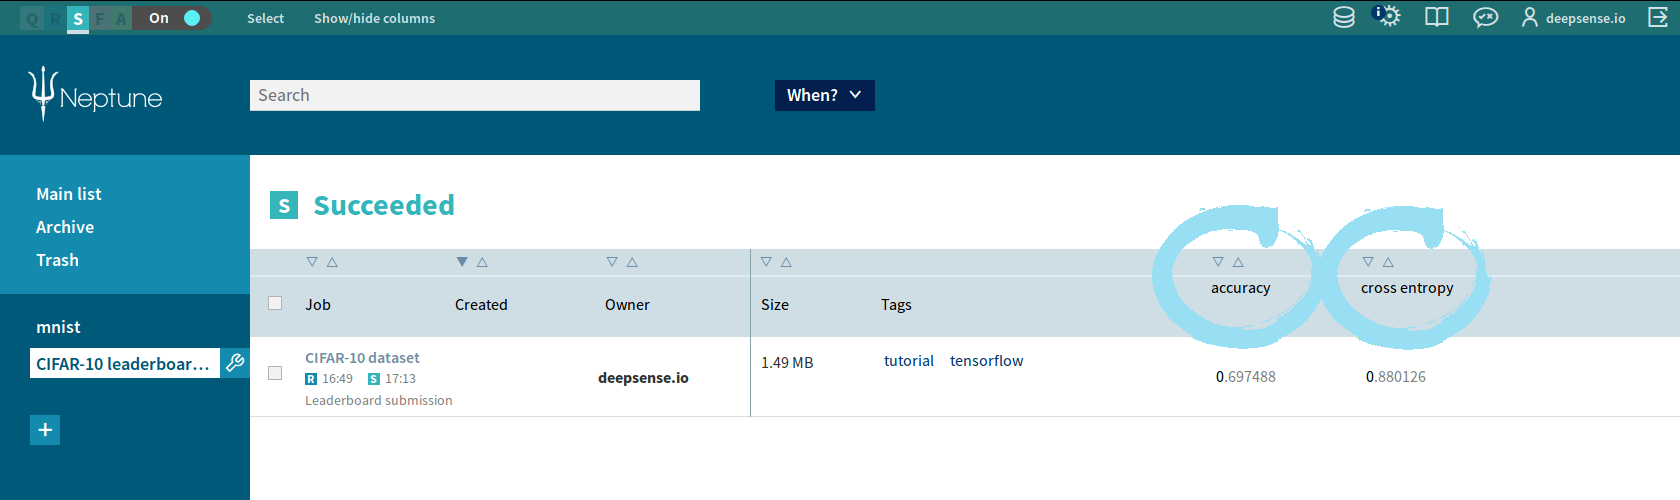 An internal validation leaderboard in Neptune - deepsense ai